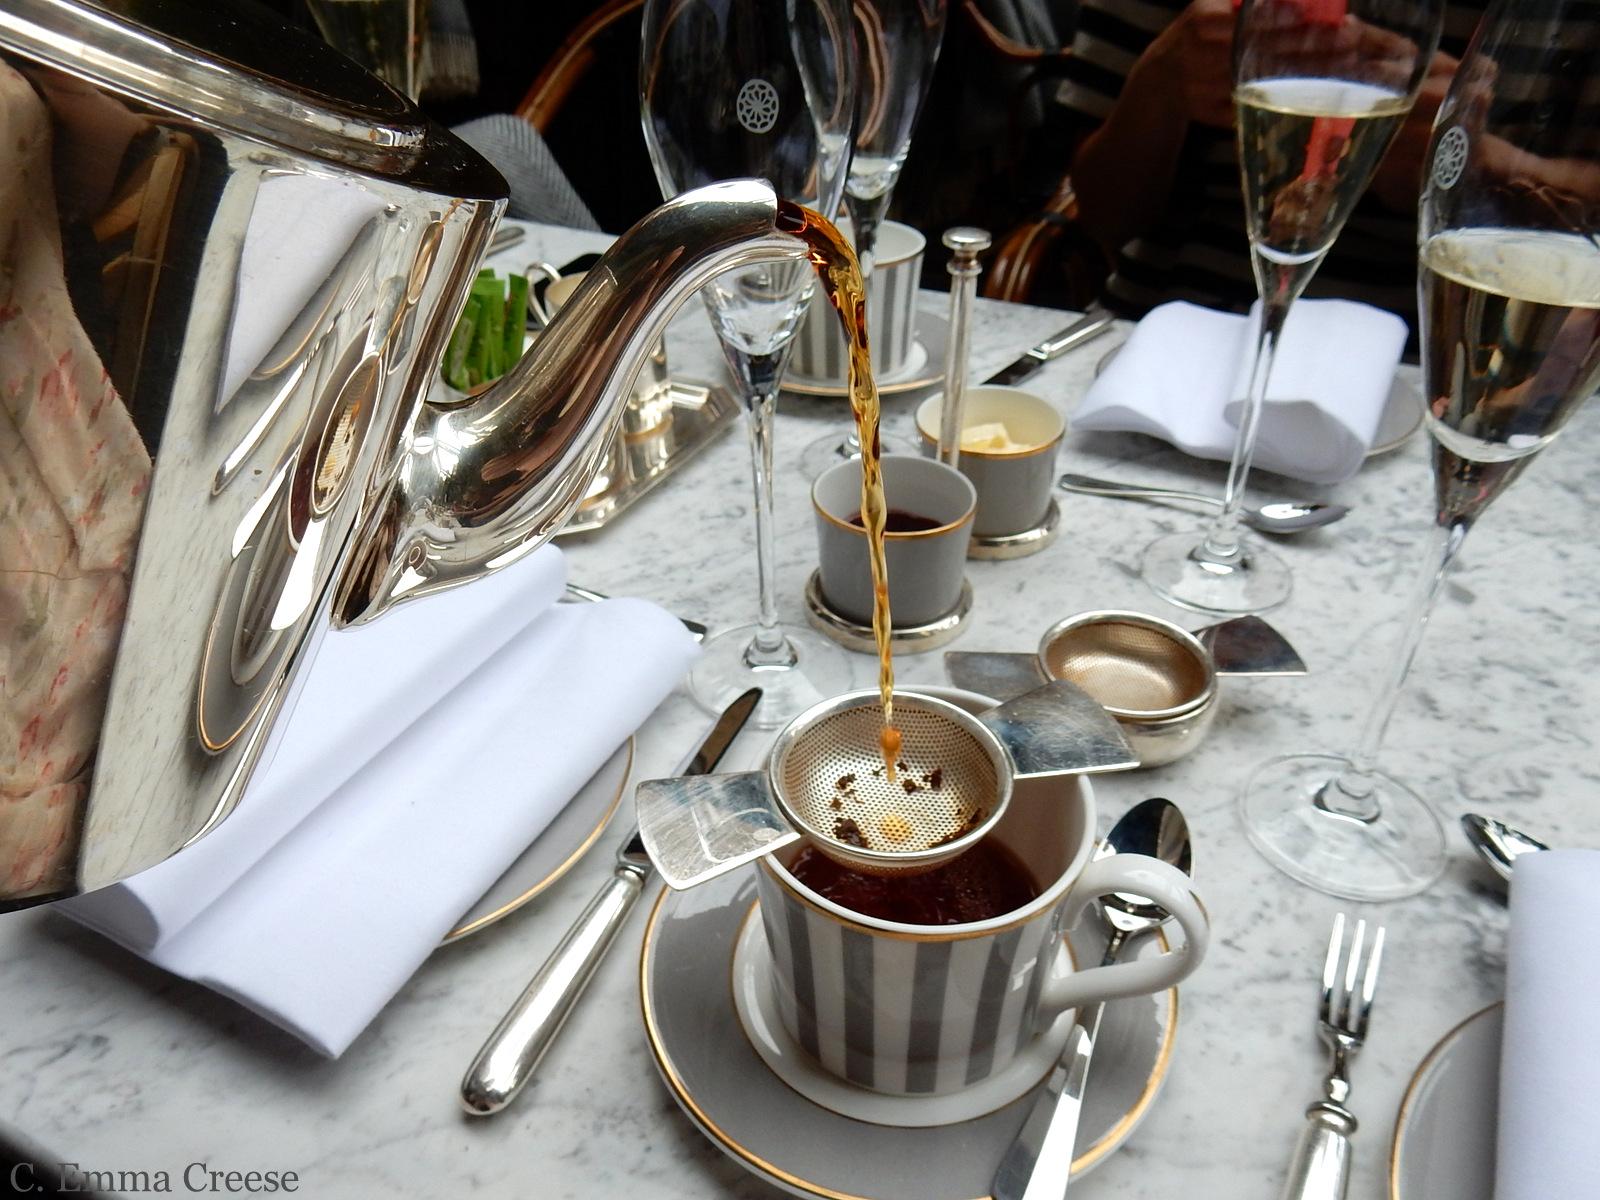 Afternoon tea dalloway terrace bloomsbury hotel a for Dalloway terrace hotel